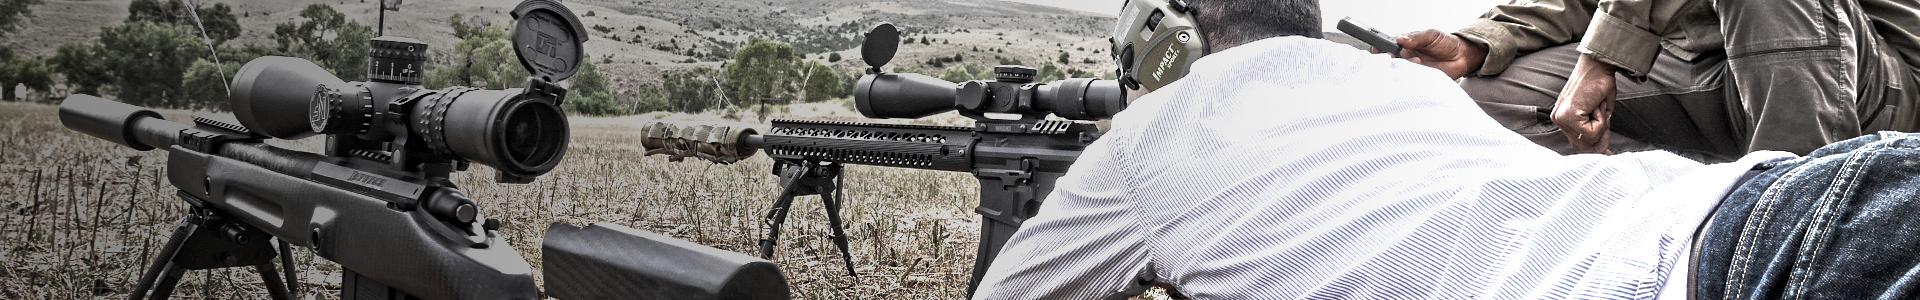 Carbine Shooter Impact Ear Pro